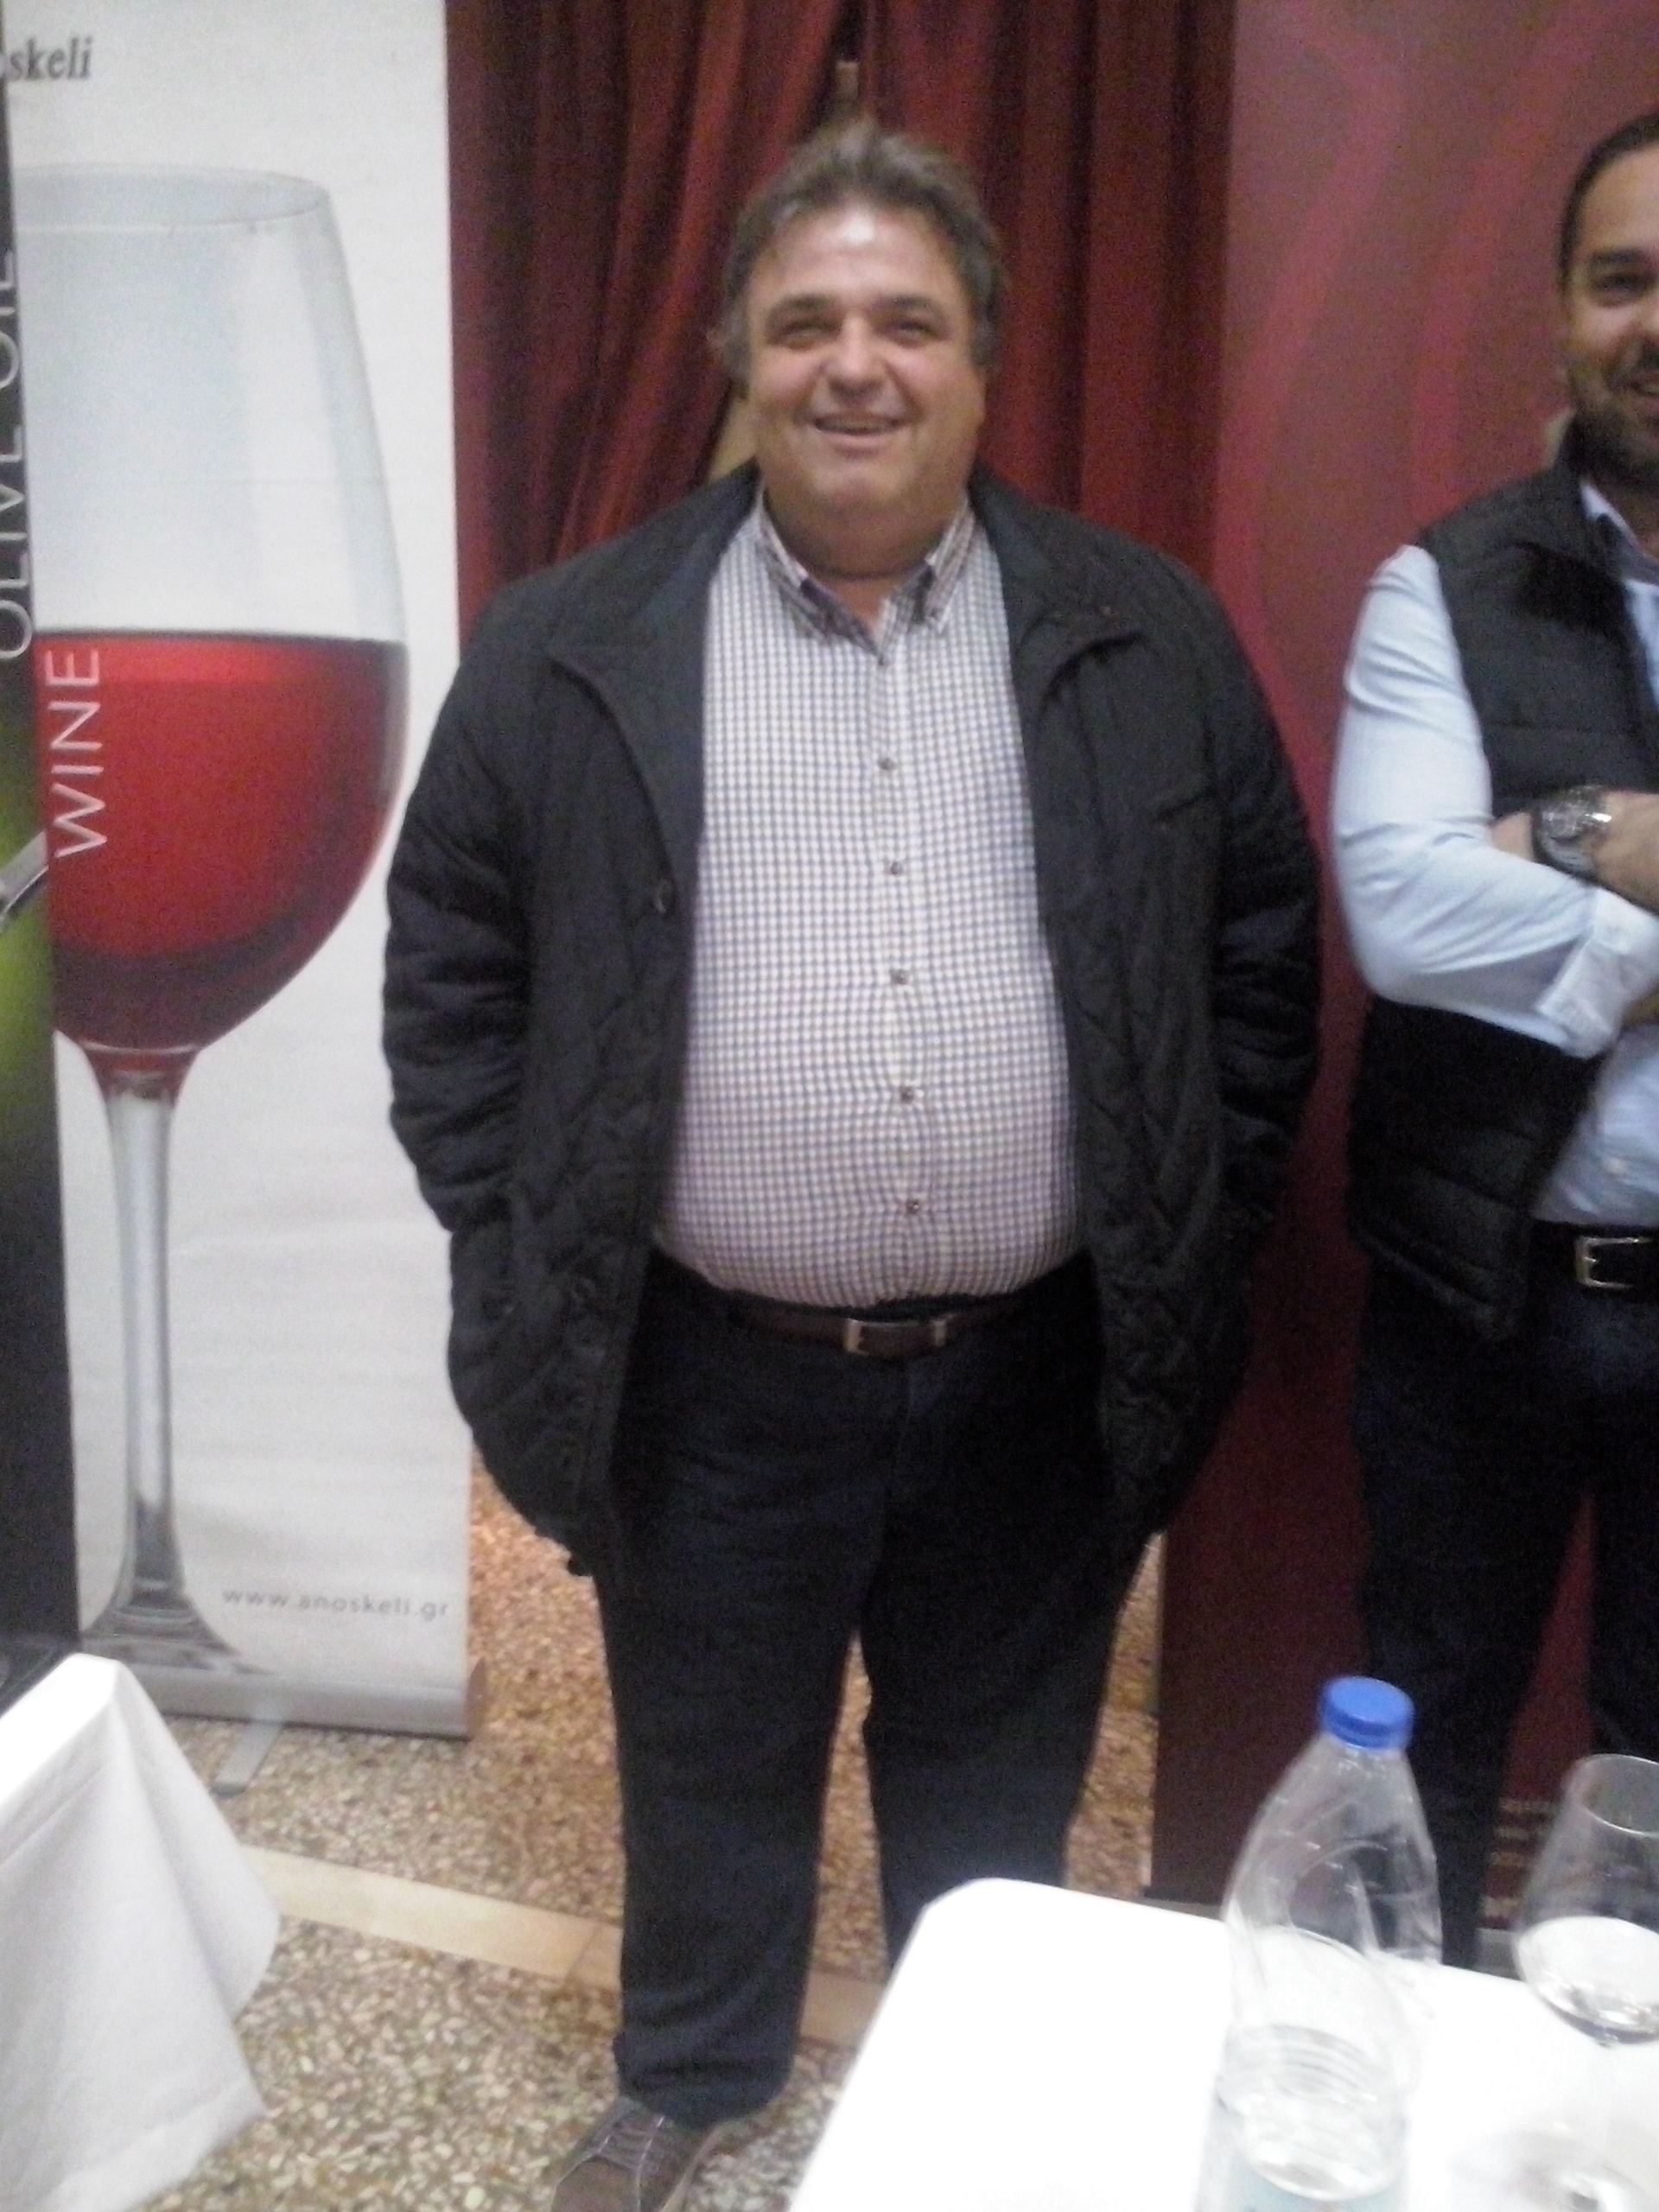 Weinfest 2017 Organizer Stavros Chatzidimitriou